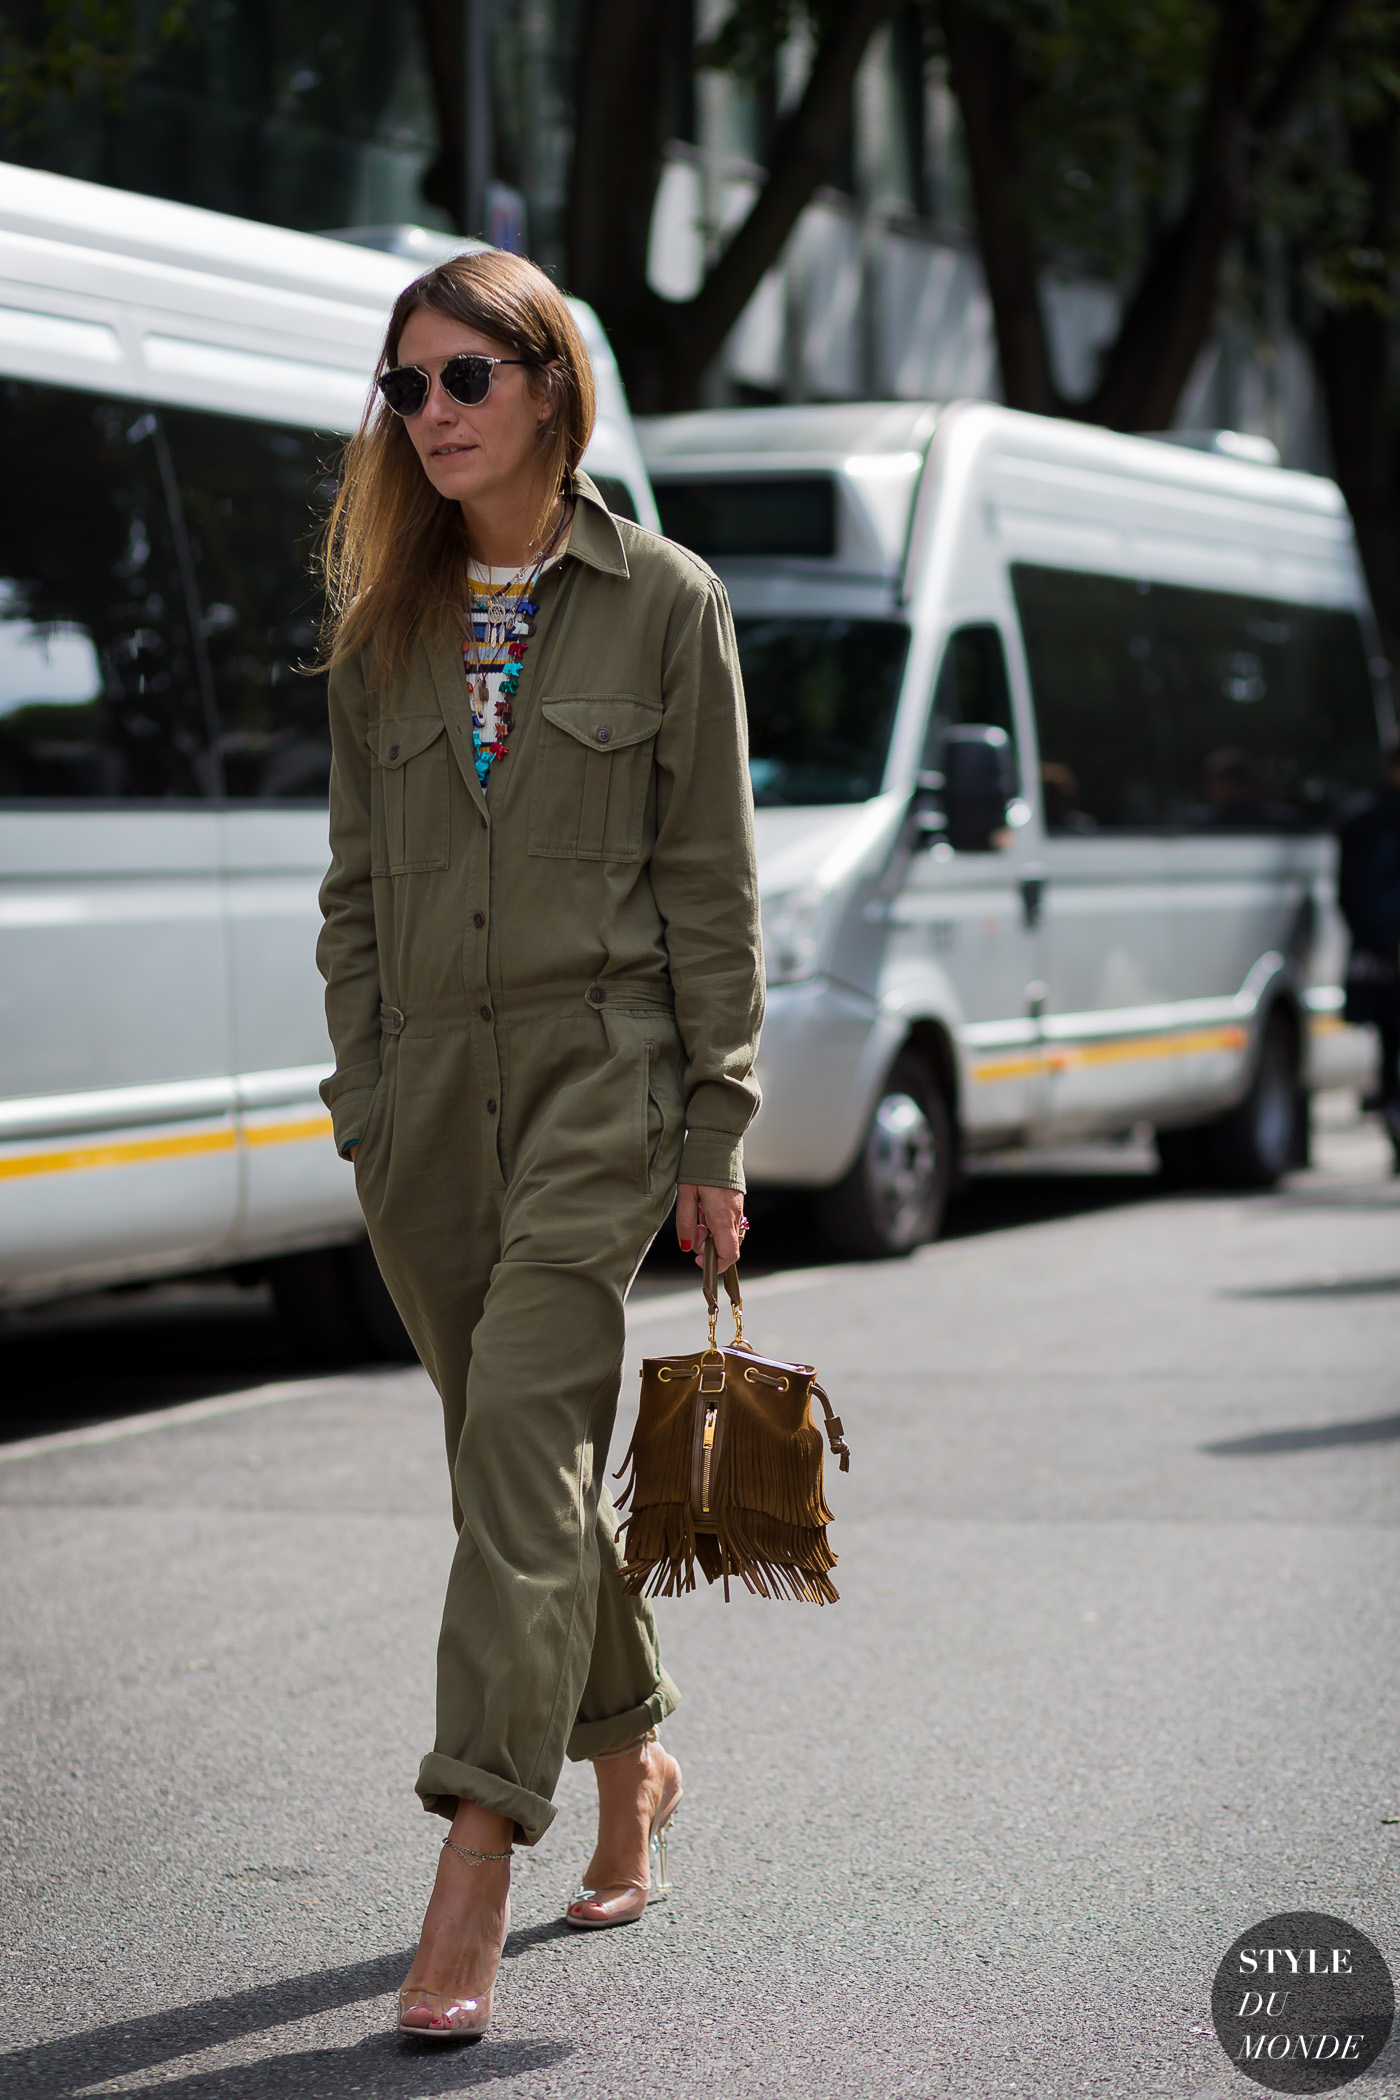 782c34ecc40 Aurora Sansone Street Style Street Fashion Streetsnaps by STYLEDUMONDE  Street Style Fashion Photography